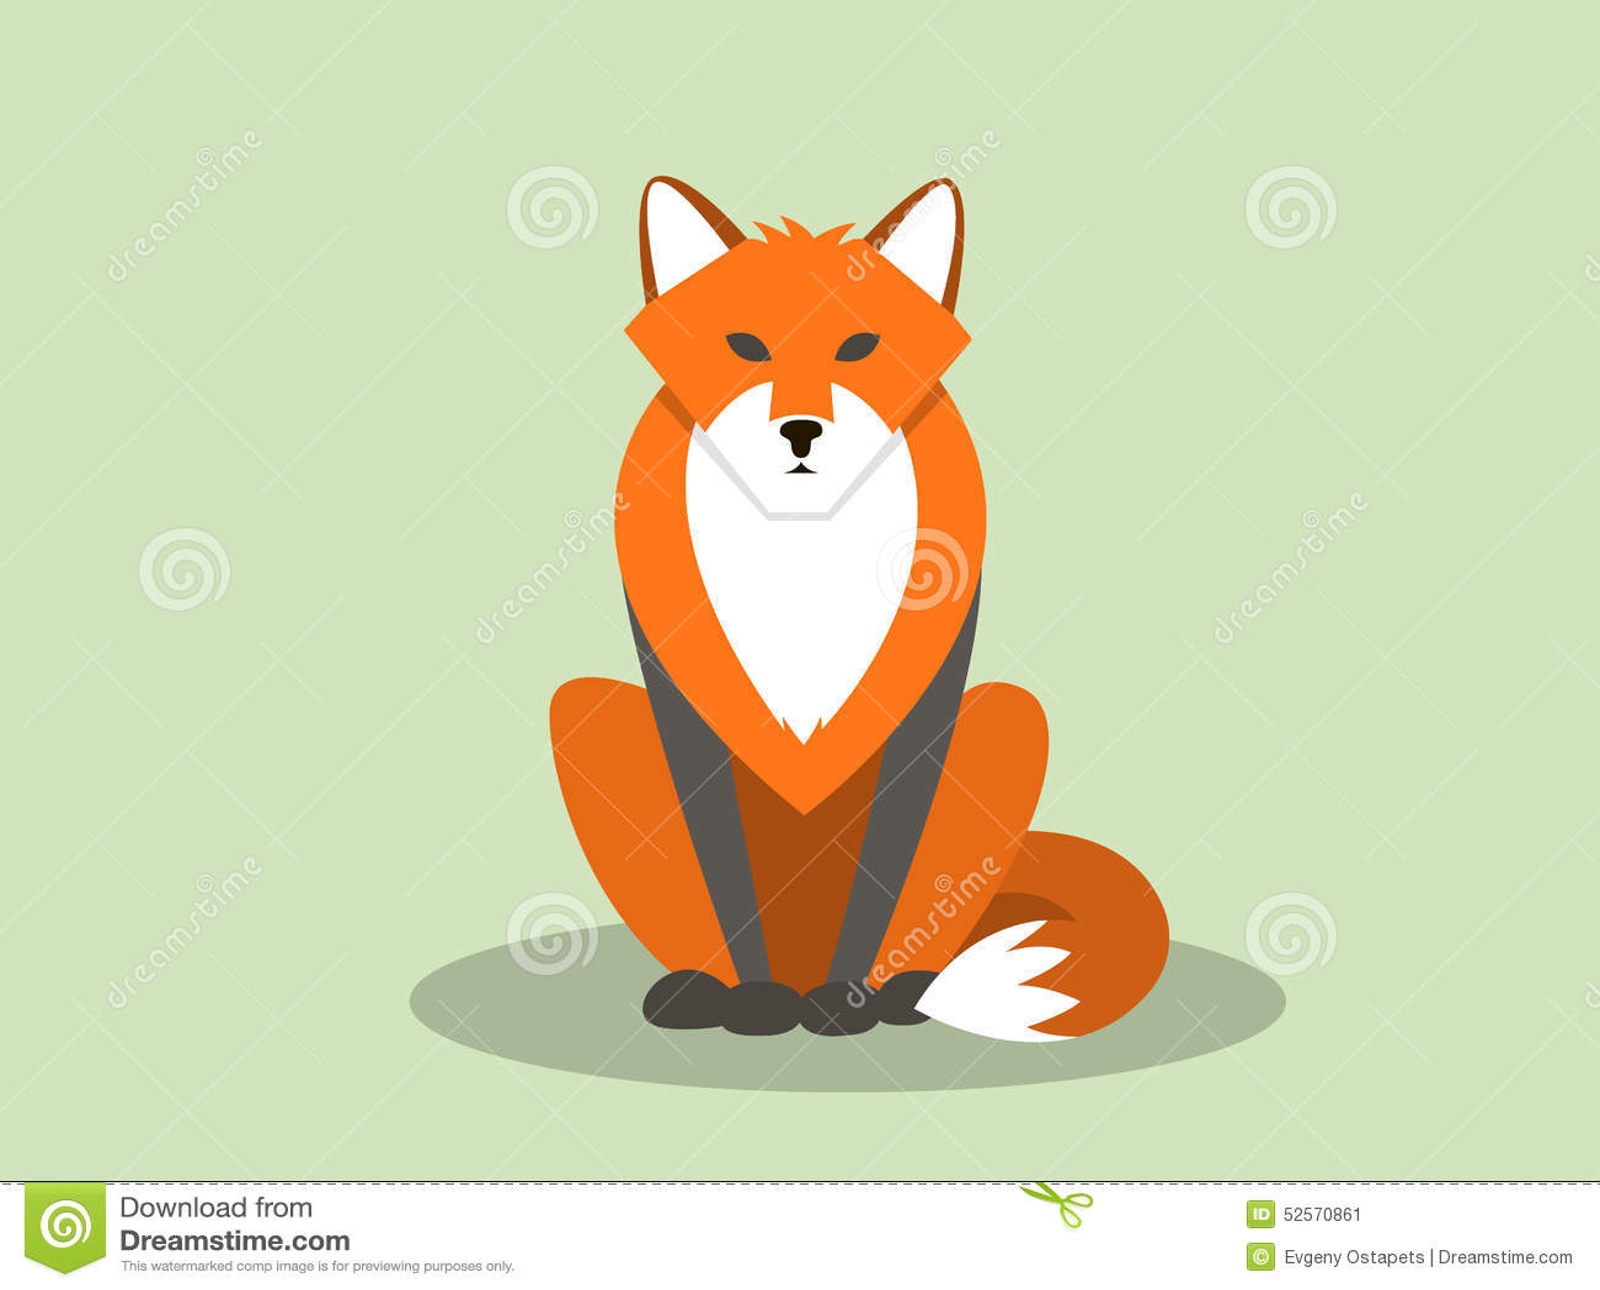 Sitting fox illustration - photo#14